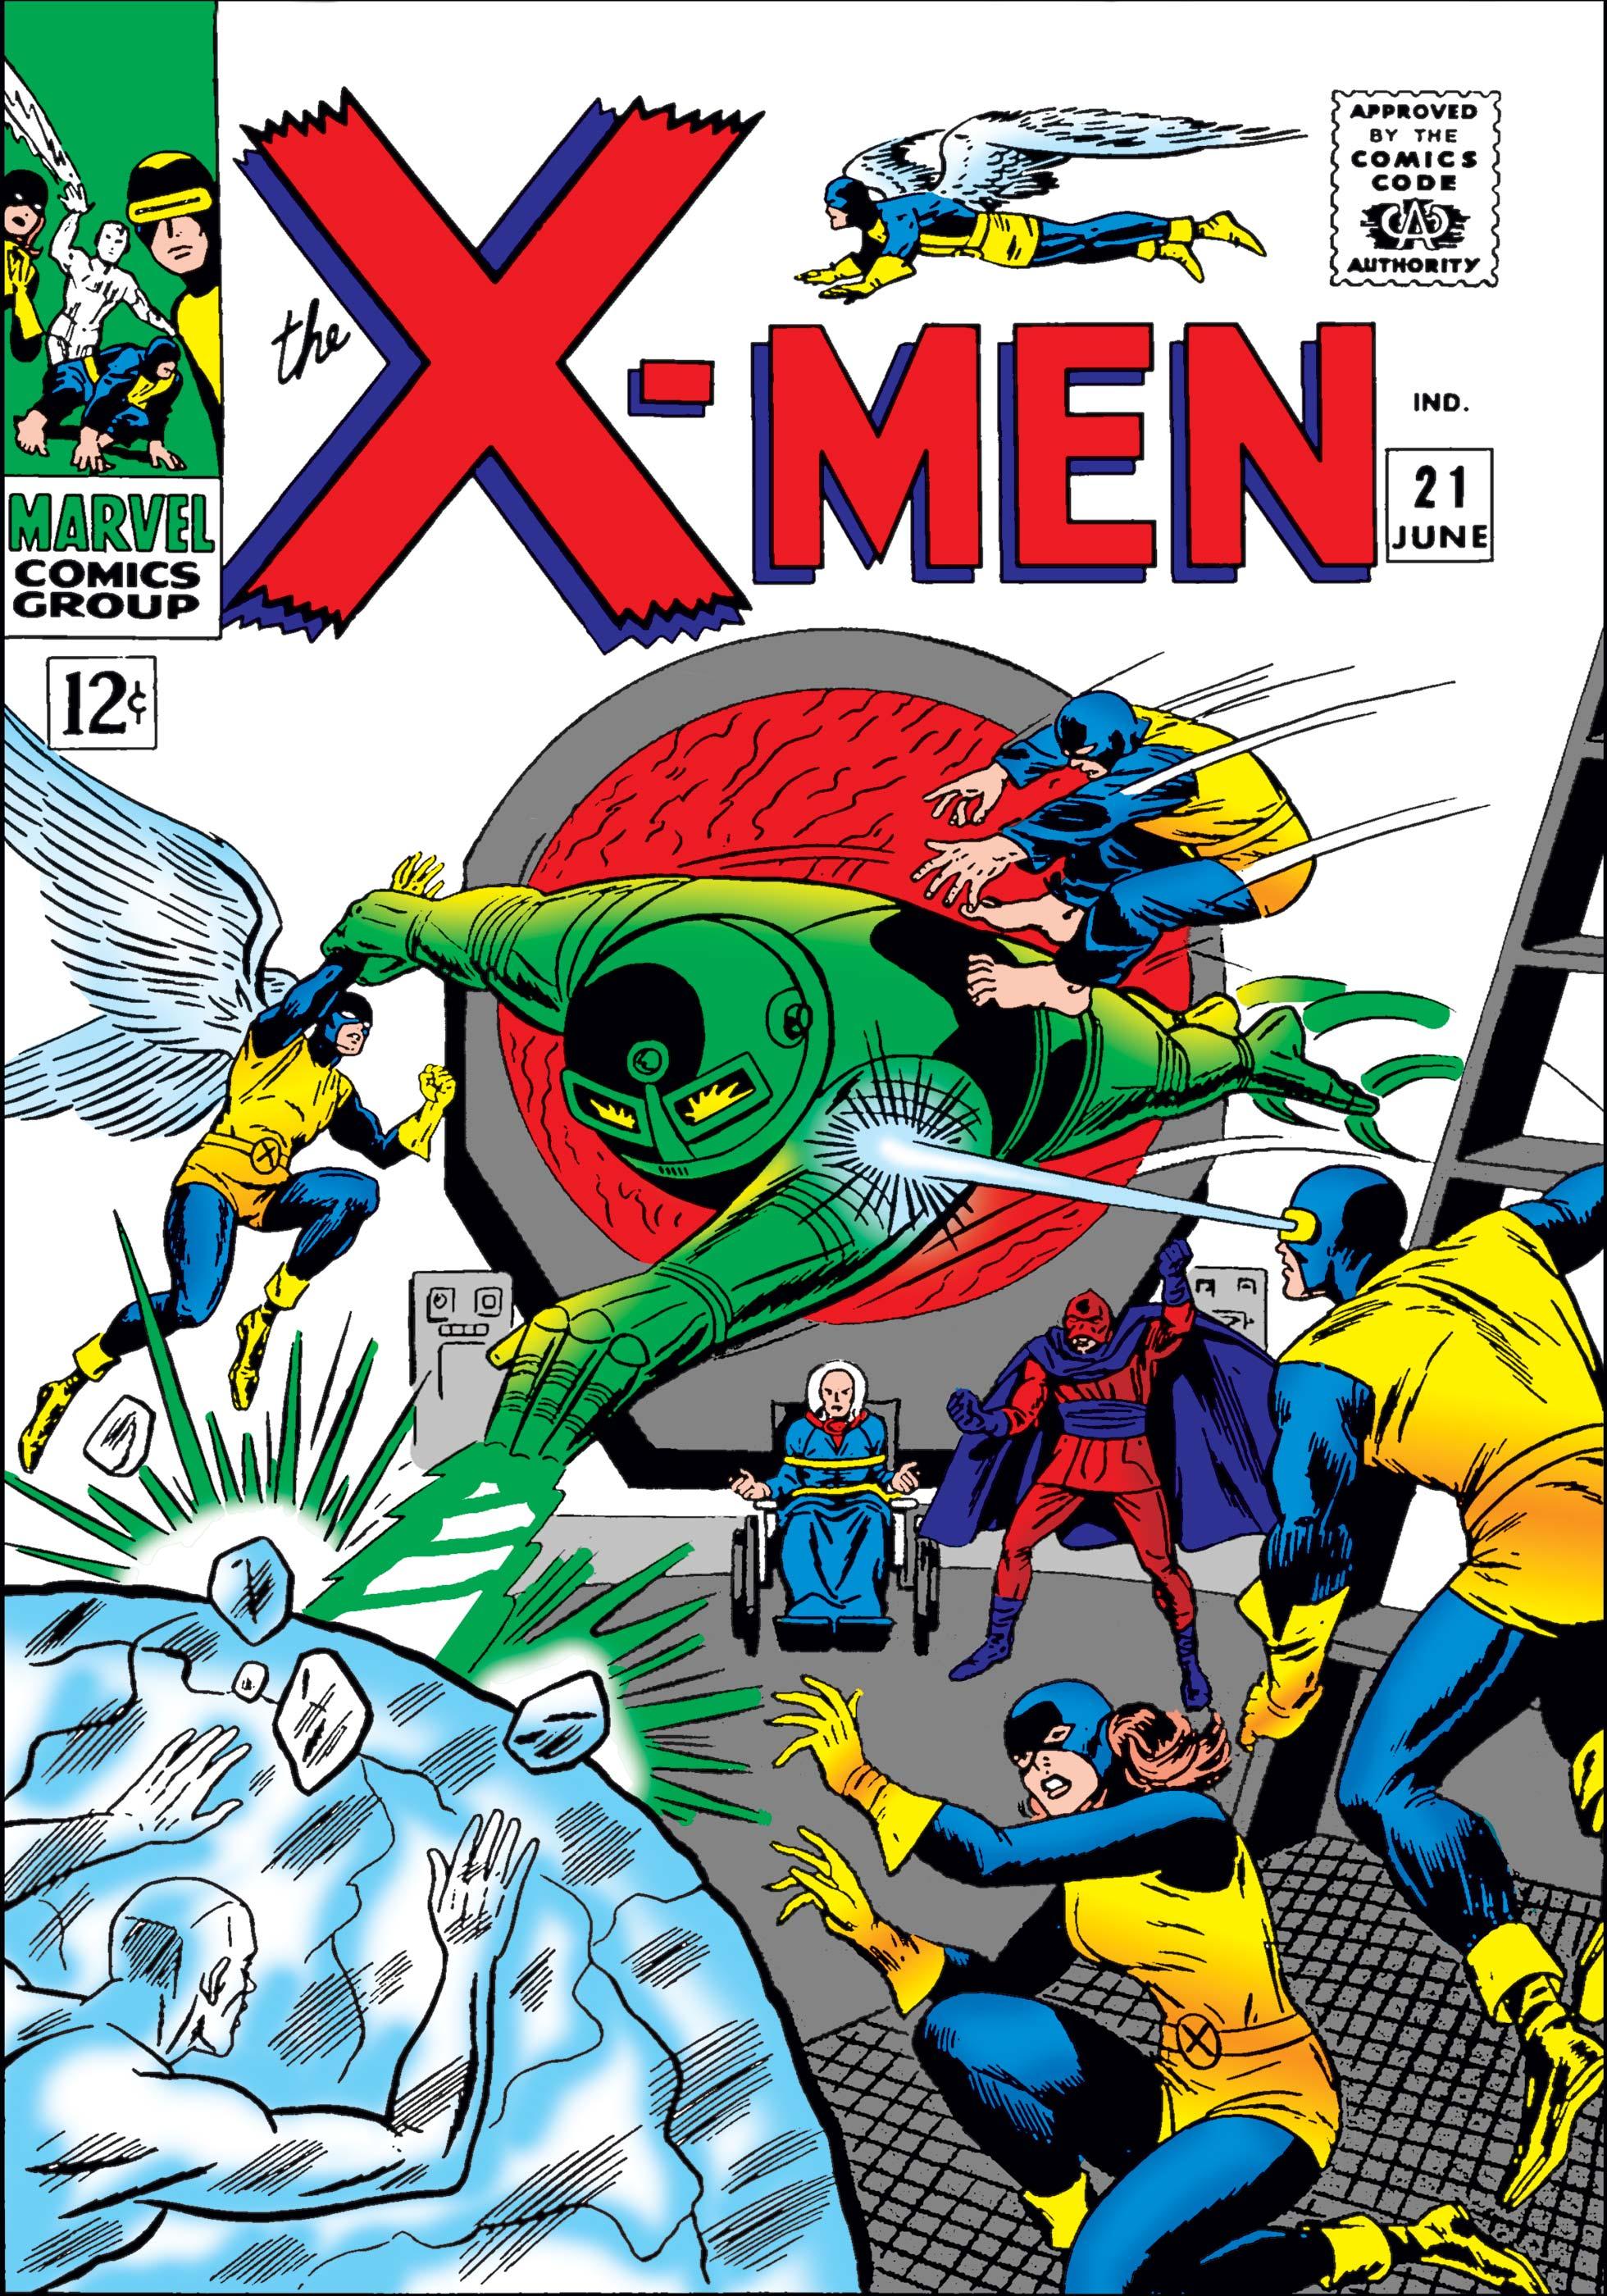 Uncanny X-Men (1963) #21